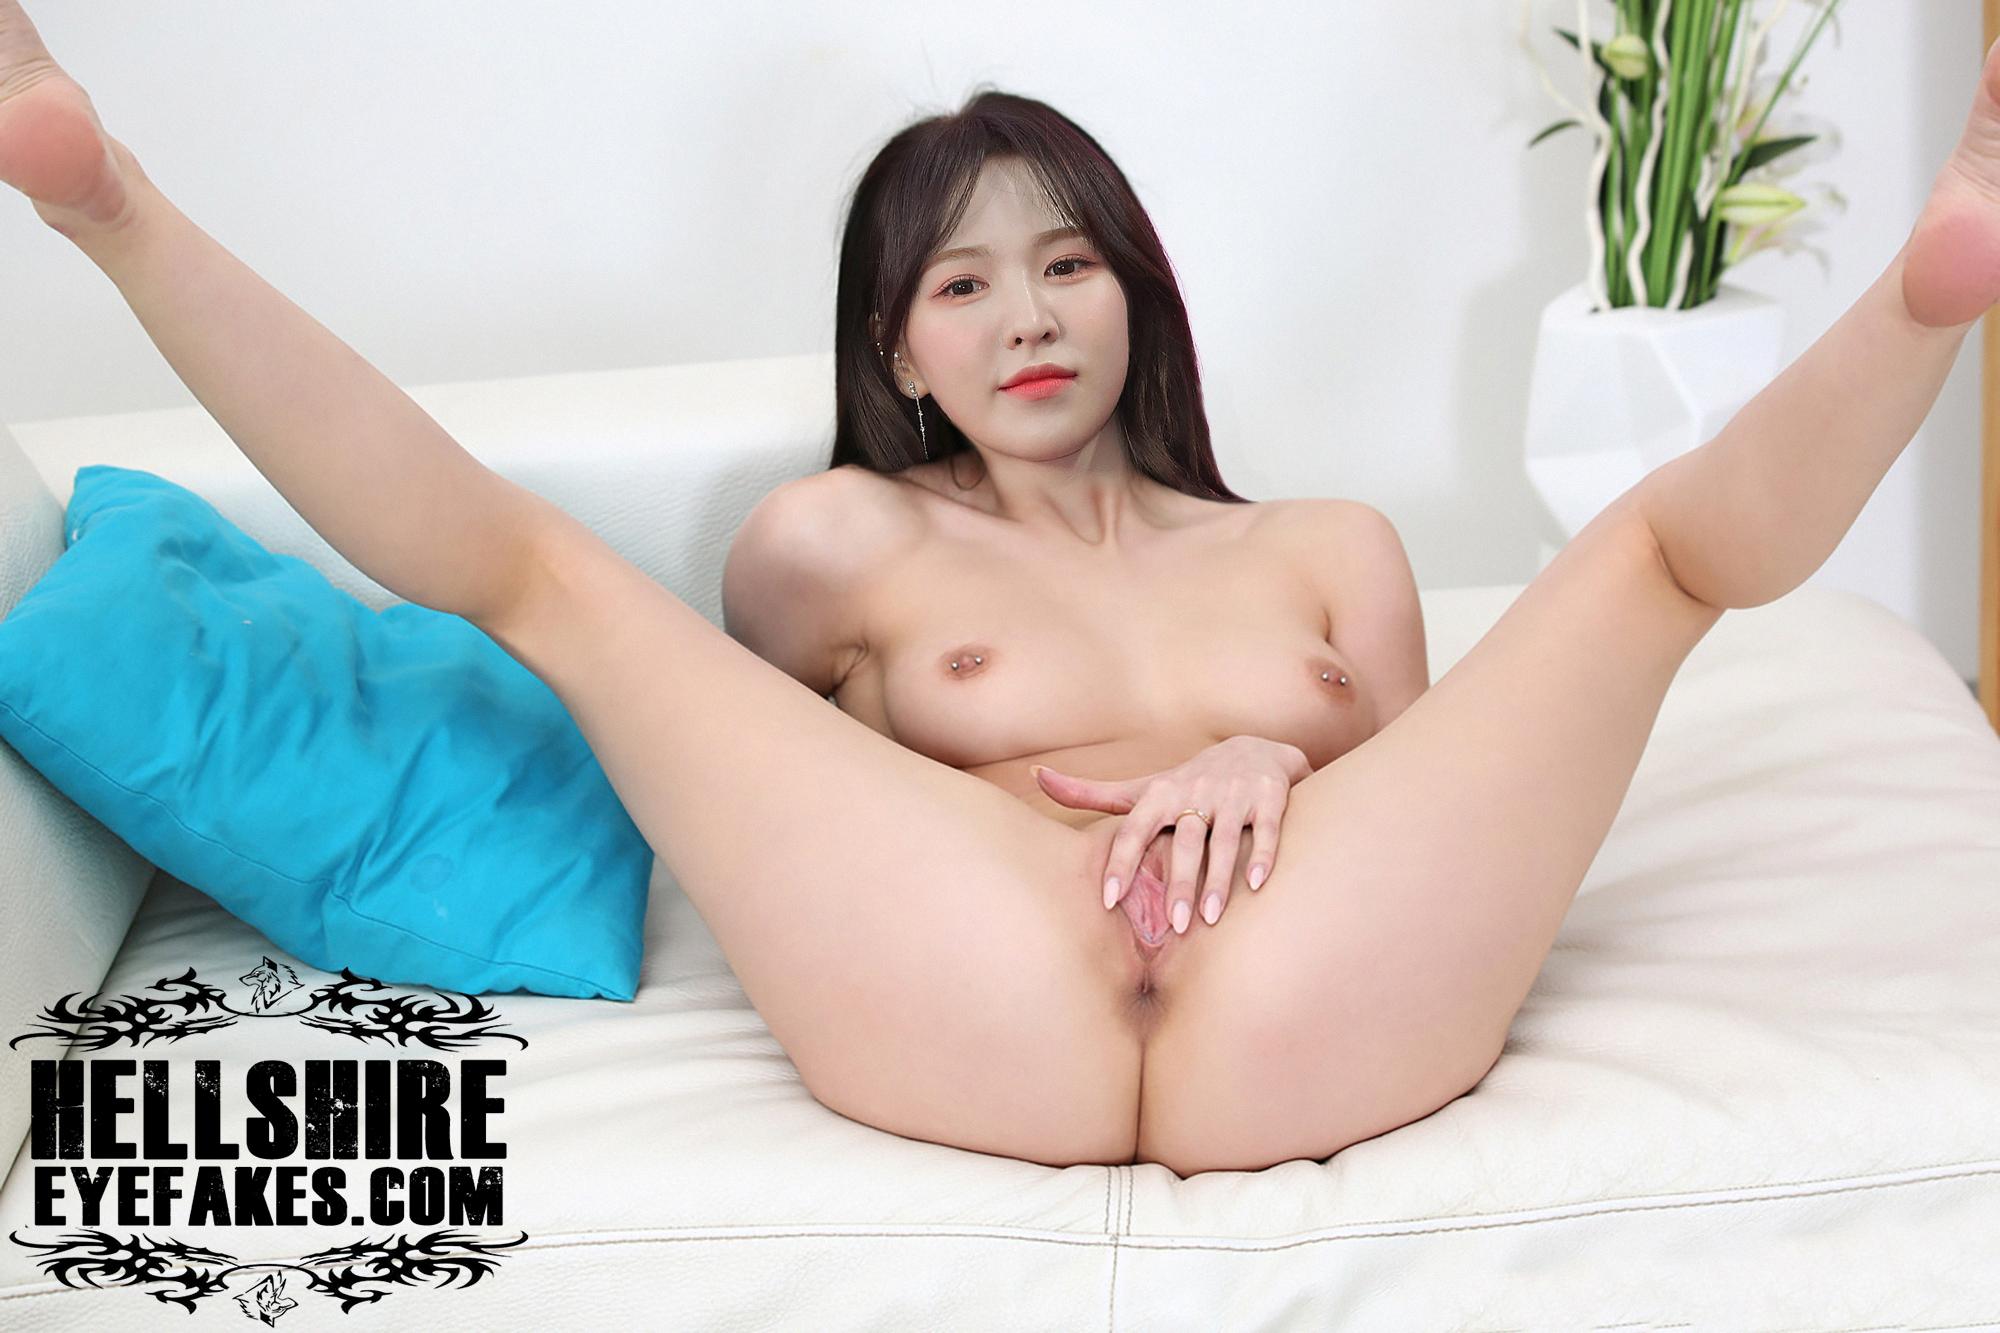 Wendy nude fake